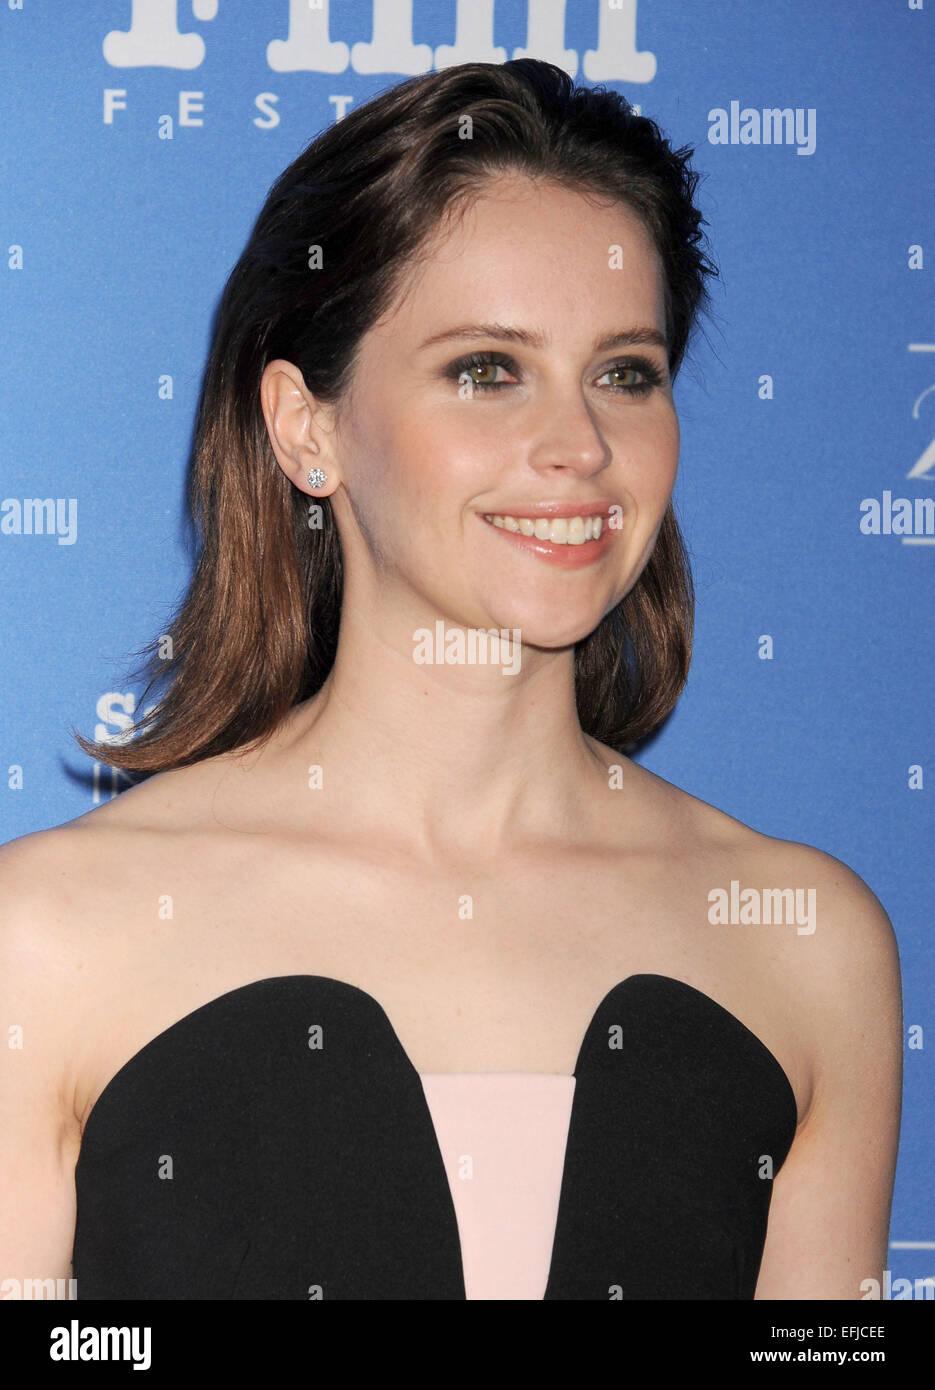 FELICITY JONES English film actress in January 2015. Photo Jeffrey Mayer - Stock Image